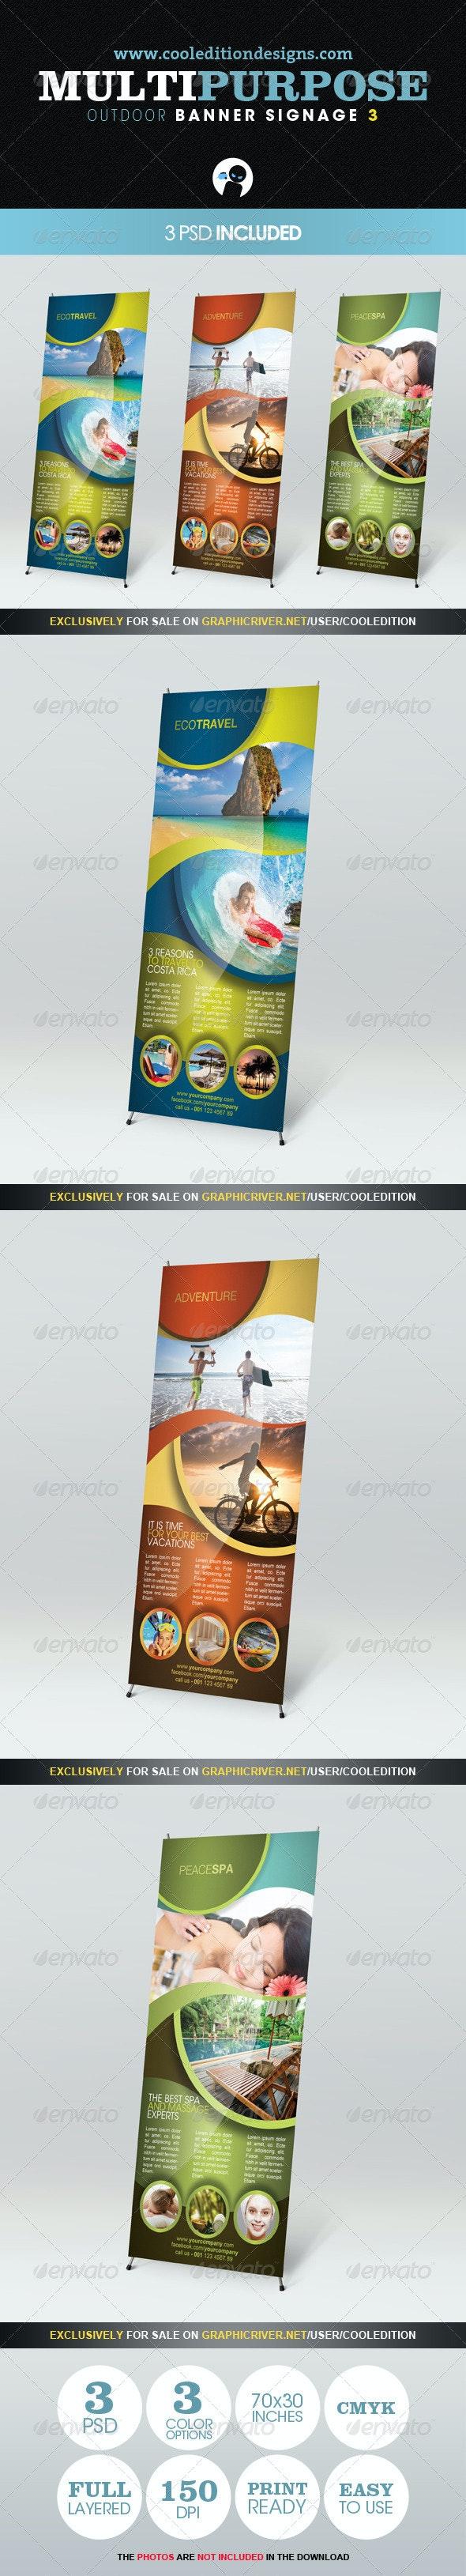 Multipurpose Outdoor Banner Signage 3 - Signage Print Templates